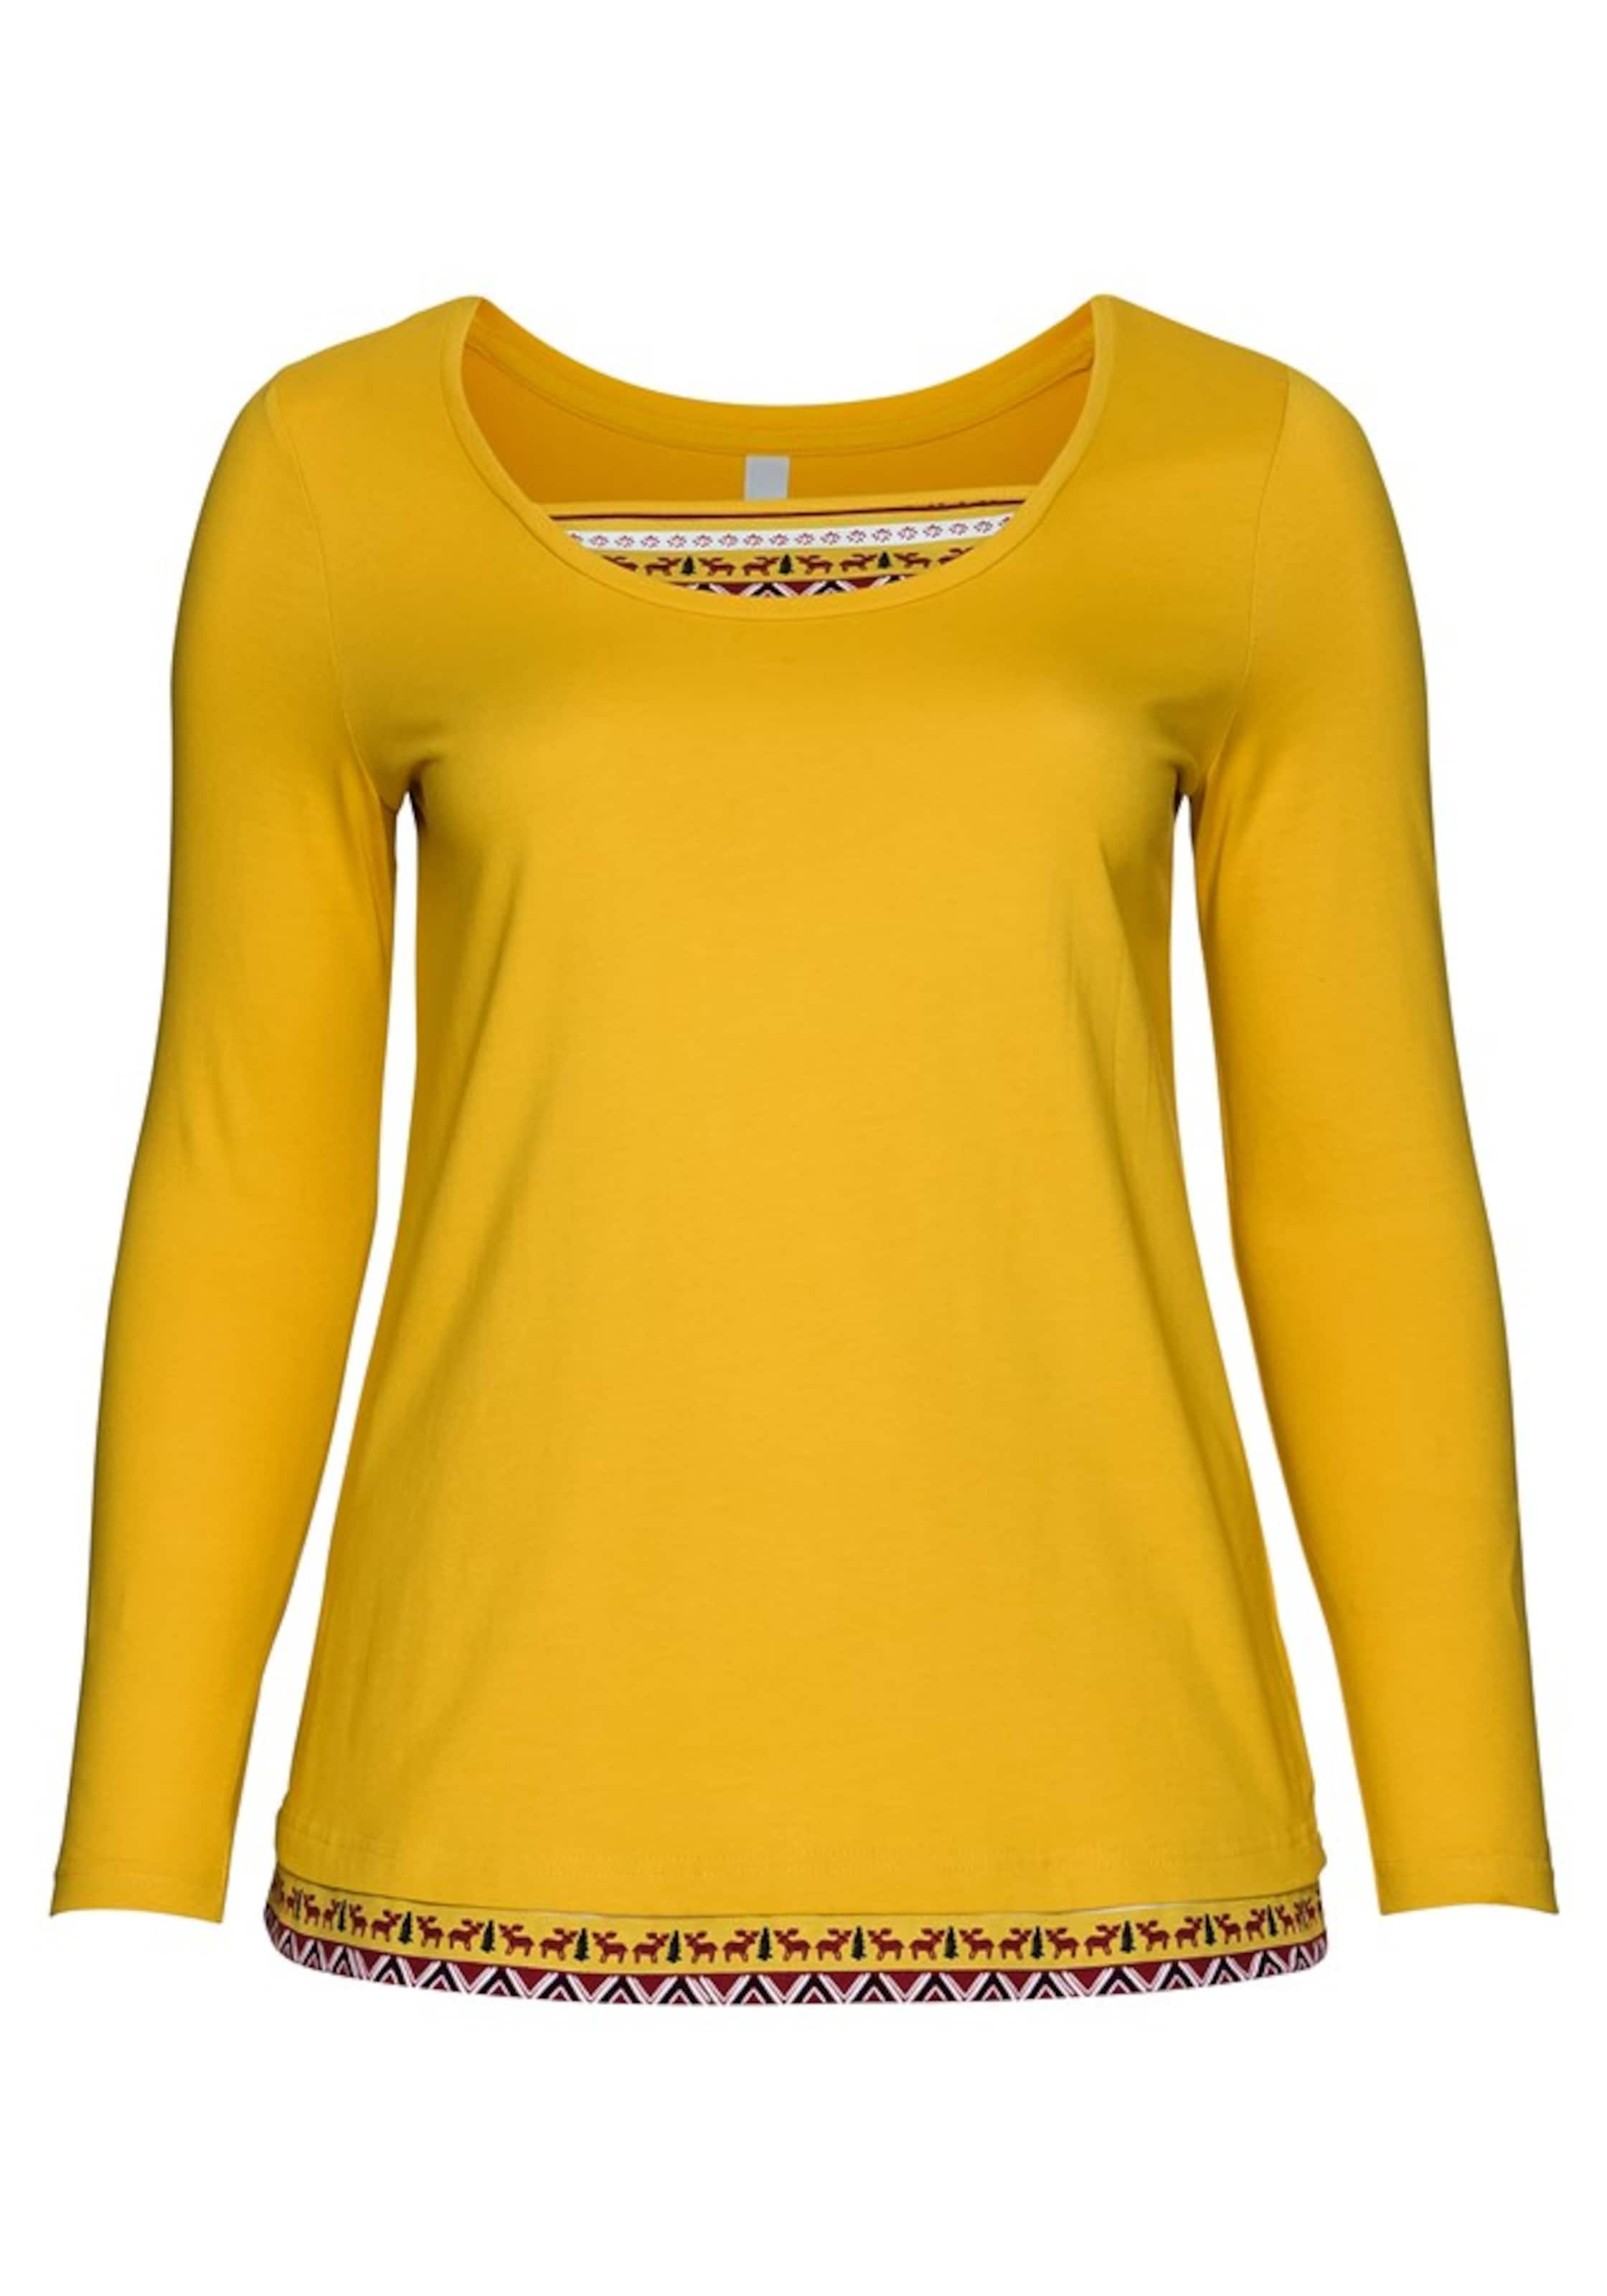 SenfMischfarben Shirt Shirt Sheego Sheego In In 8Ok0PNnwX